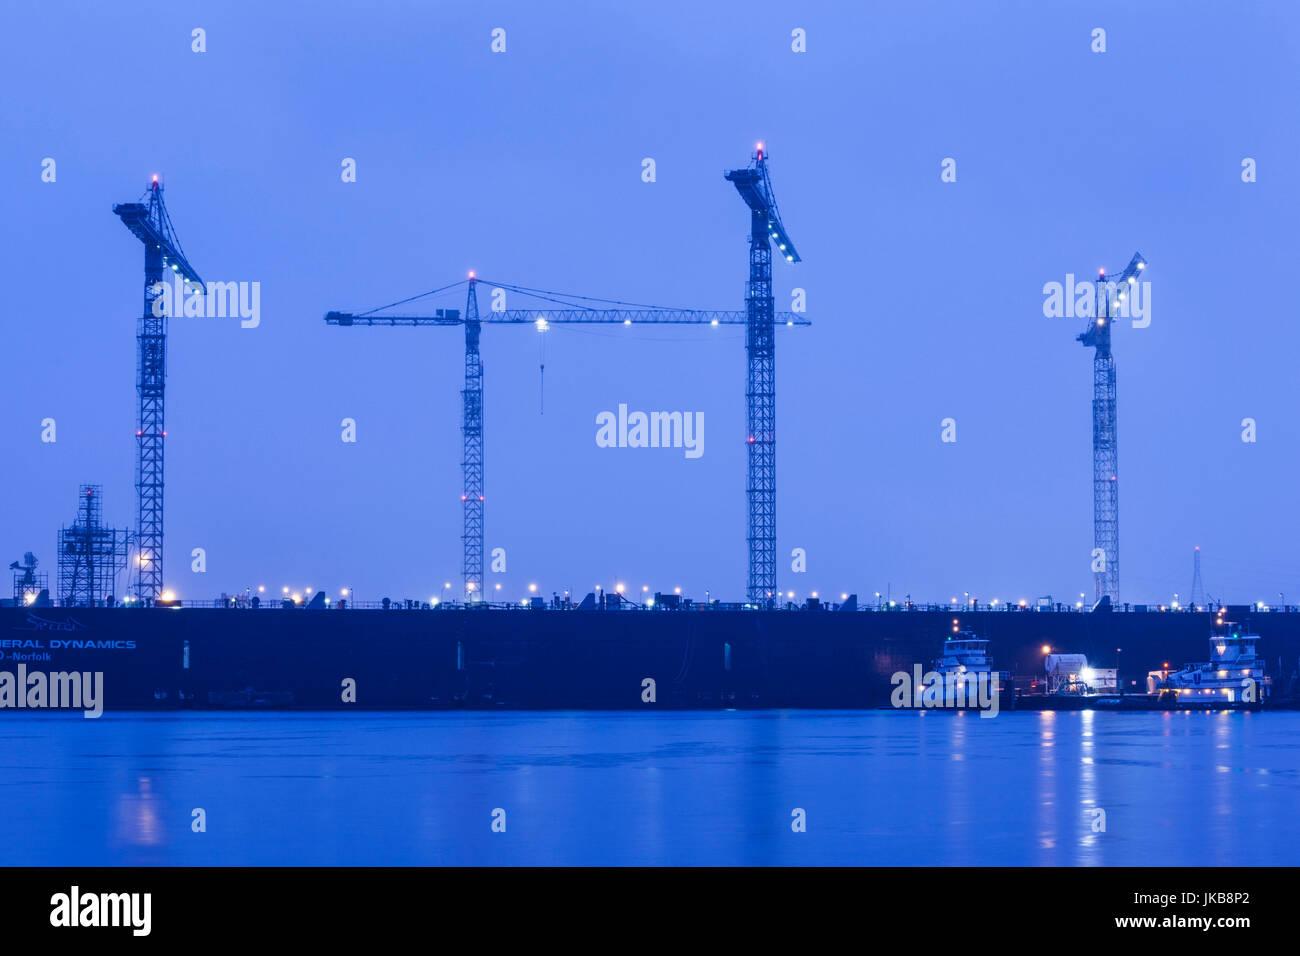 USA, Virginia, Portsmouth, Portsmouth Naval Shipyard, cranes, dawn - Stock Image